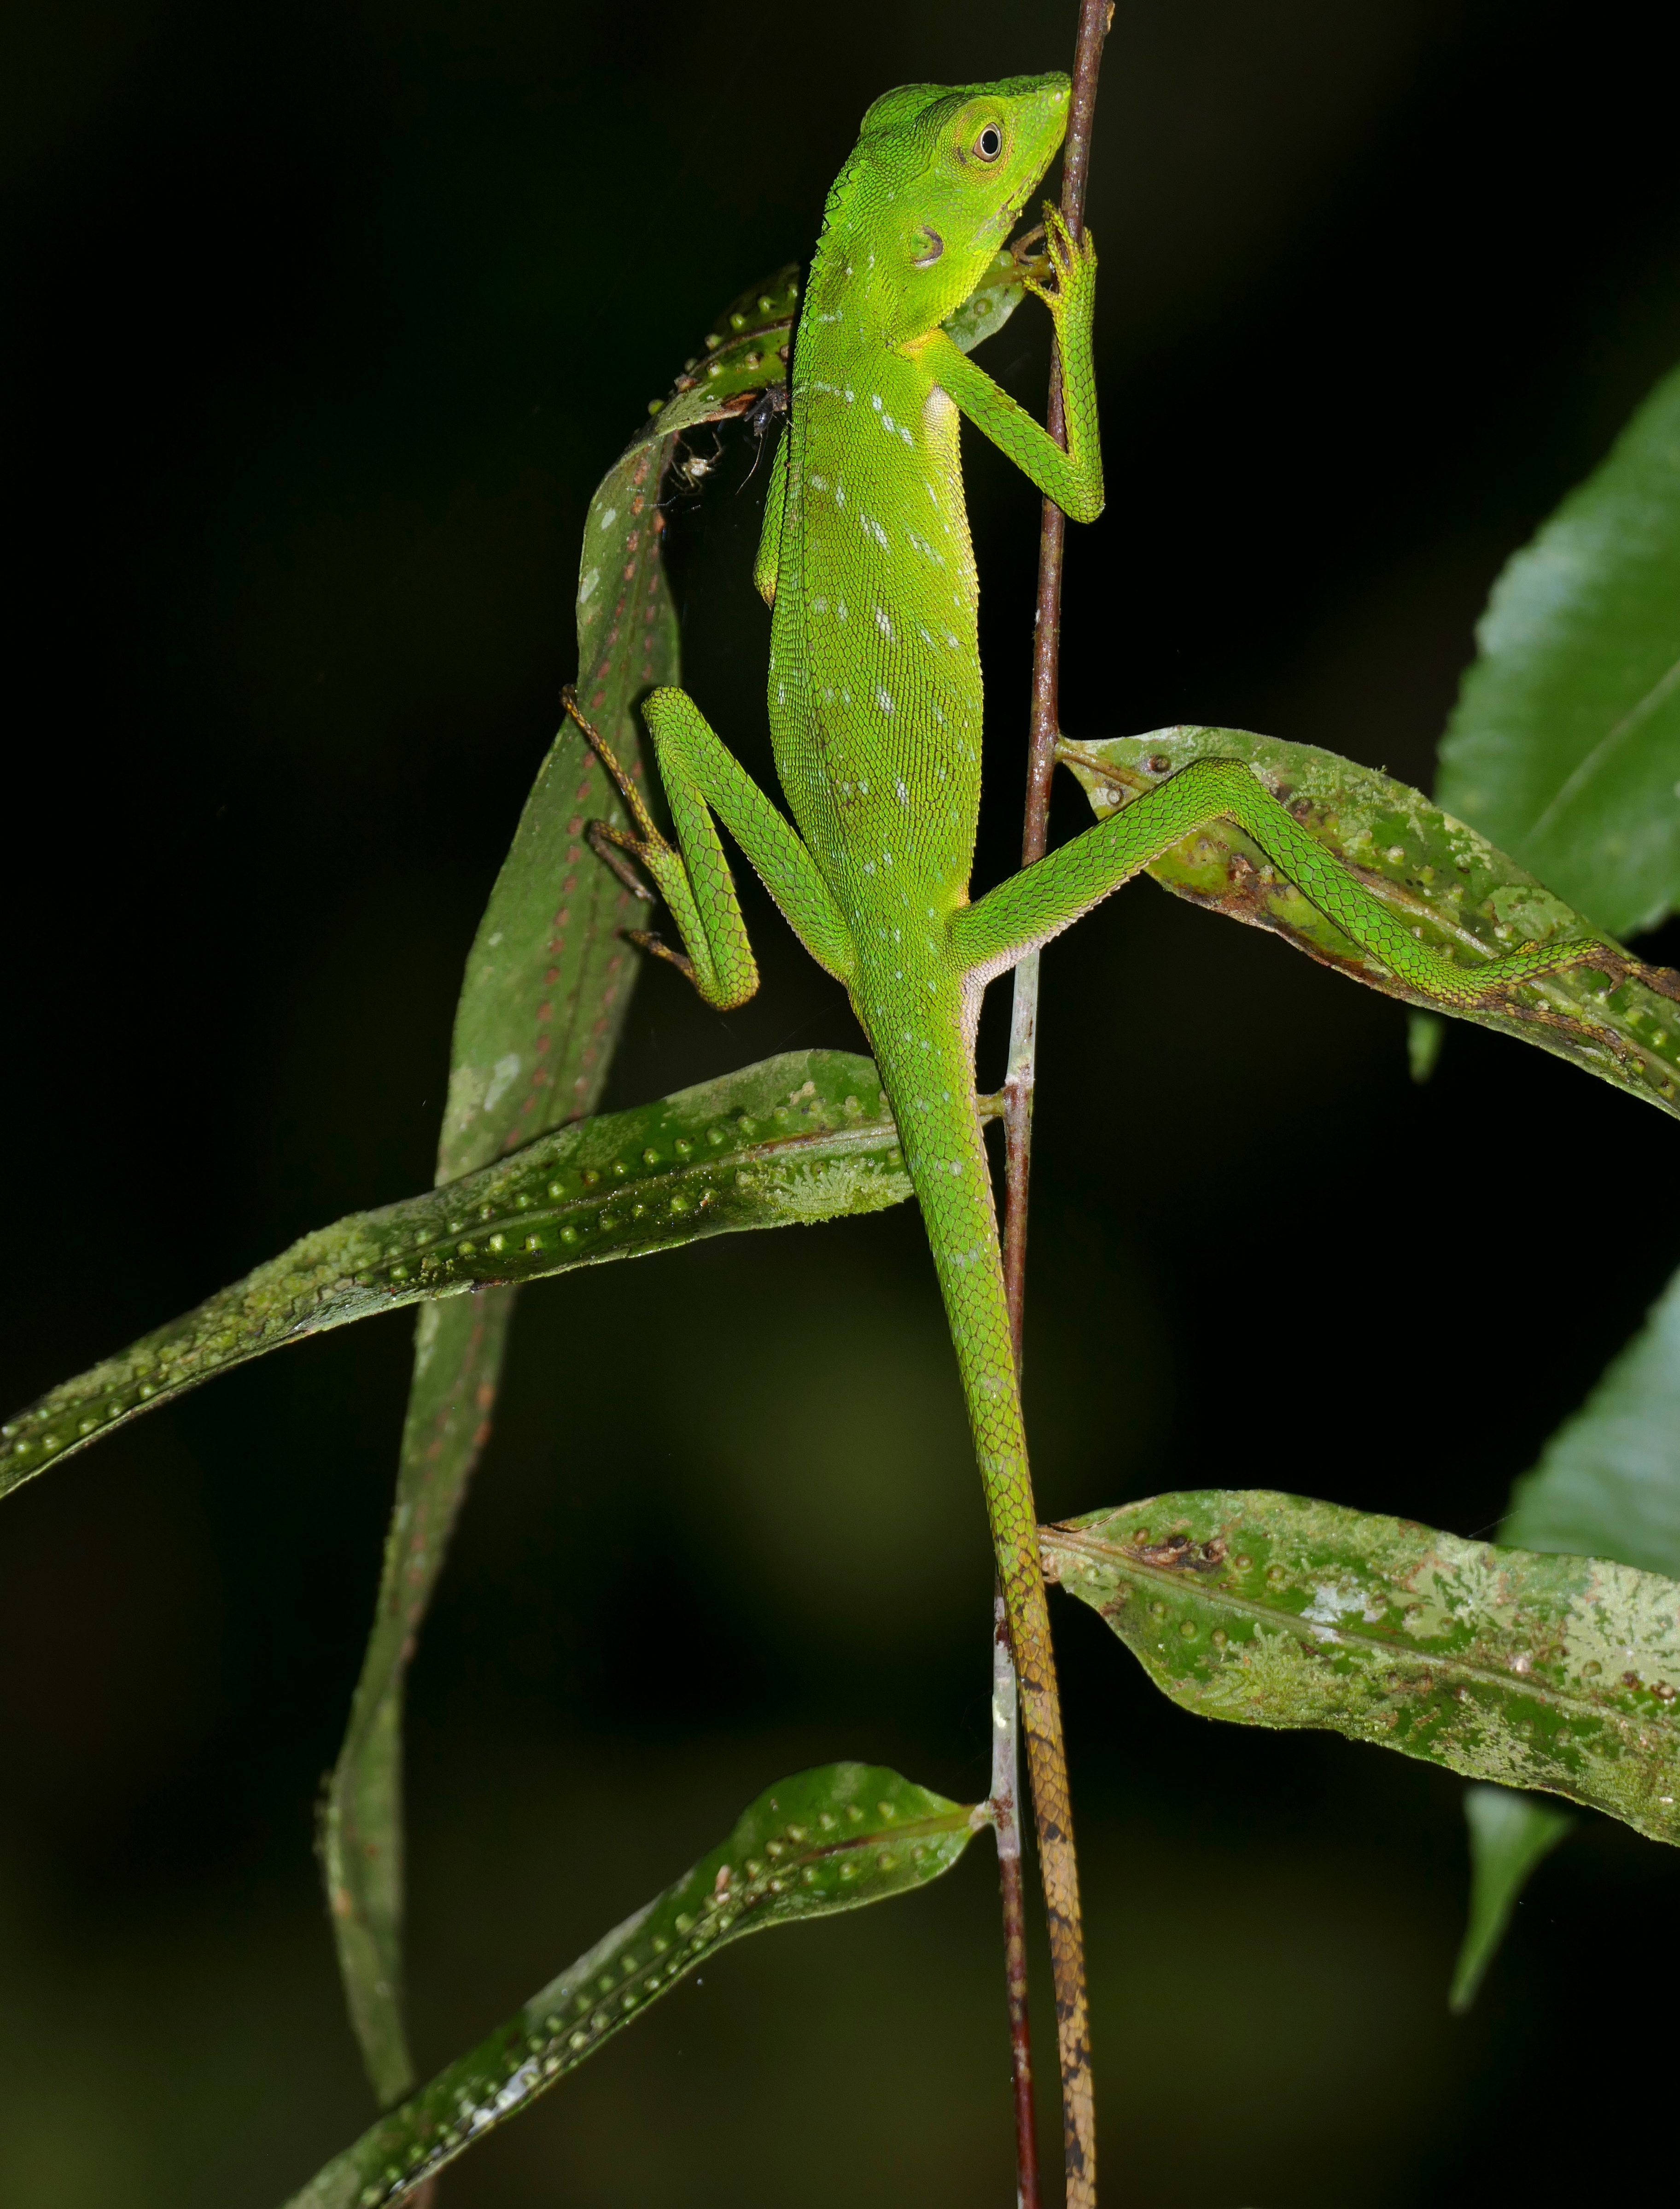 File:Green Crested Lizard (Bronchocela cristatella) (23771747885 ...